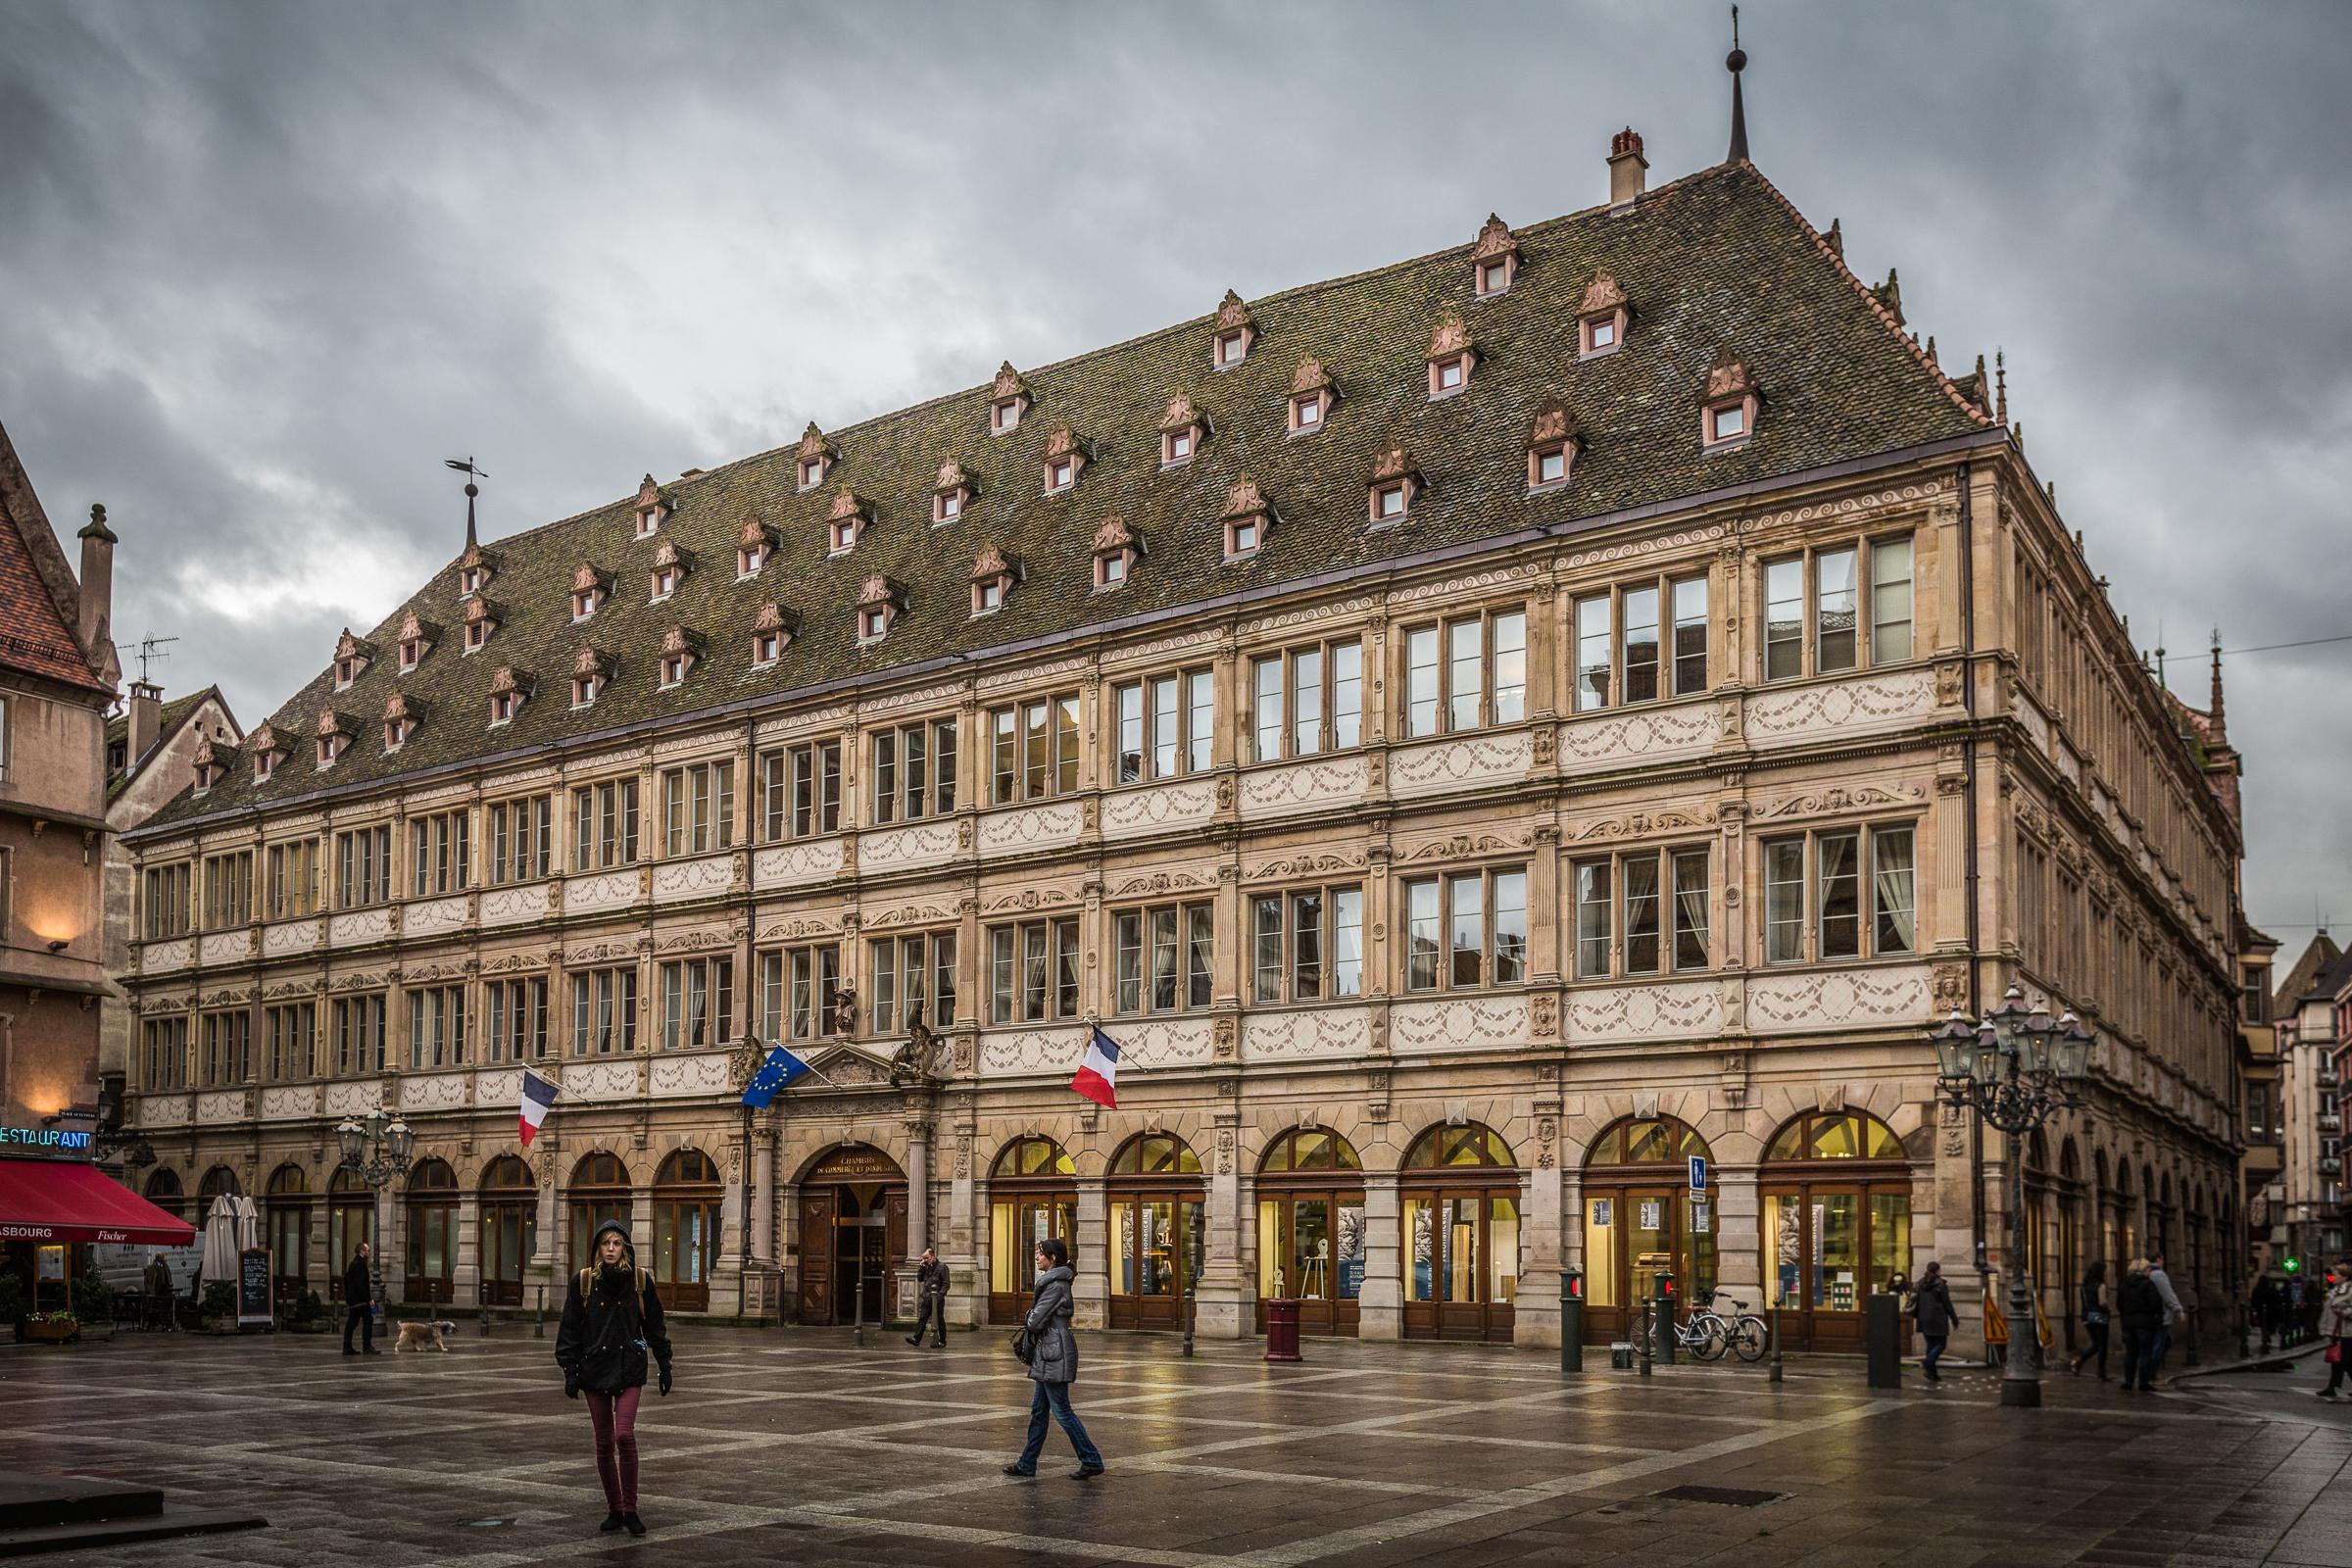 Neubau (Strasbourg) - Wikipedia